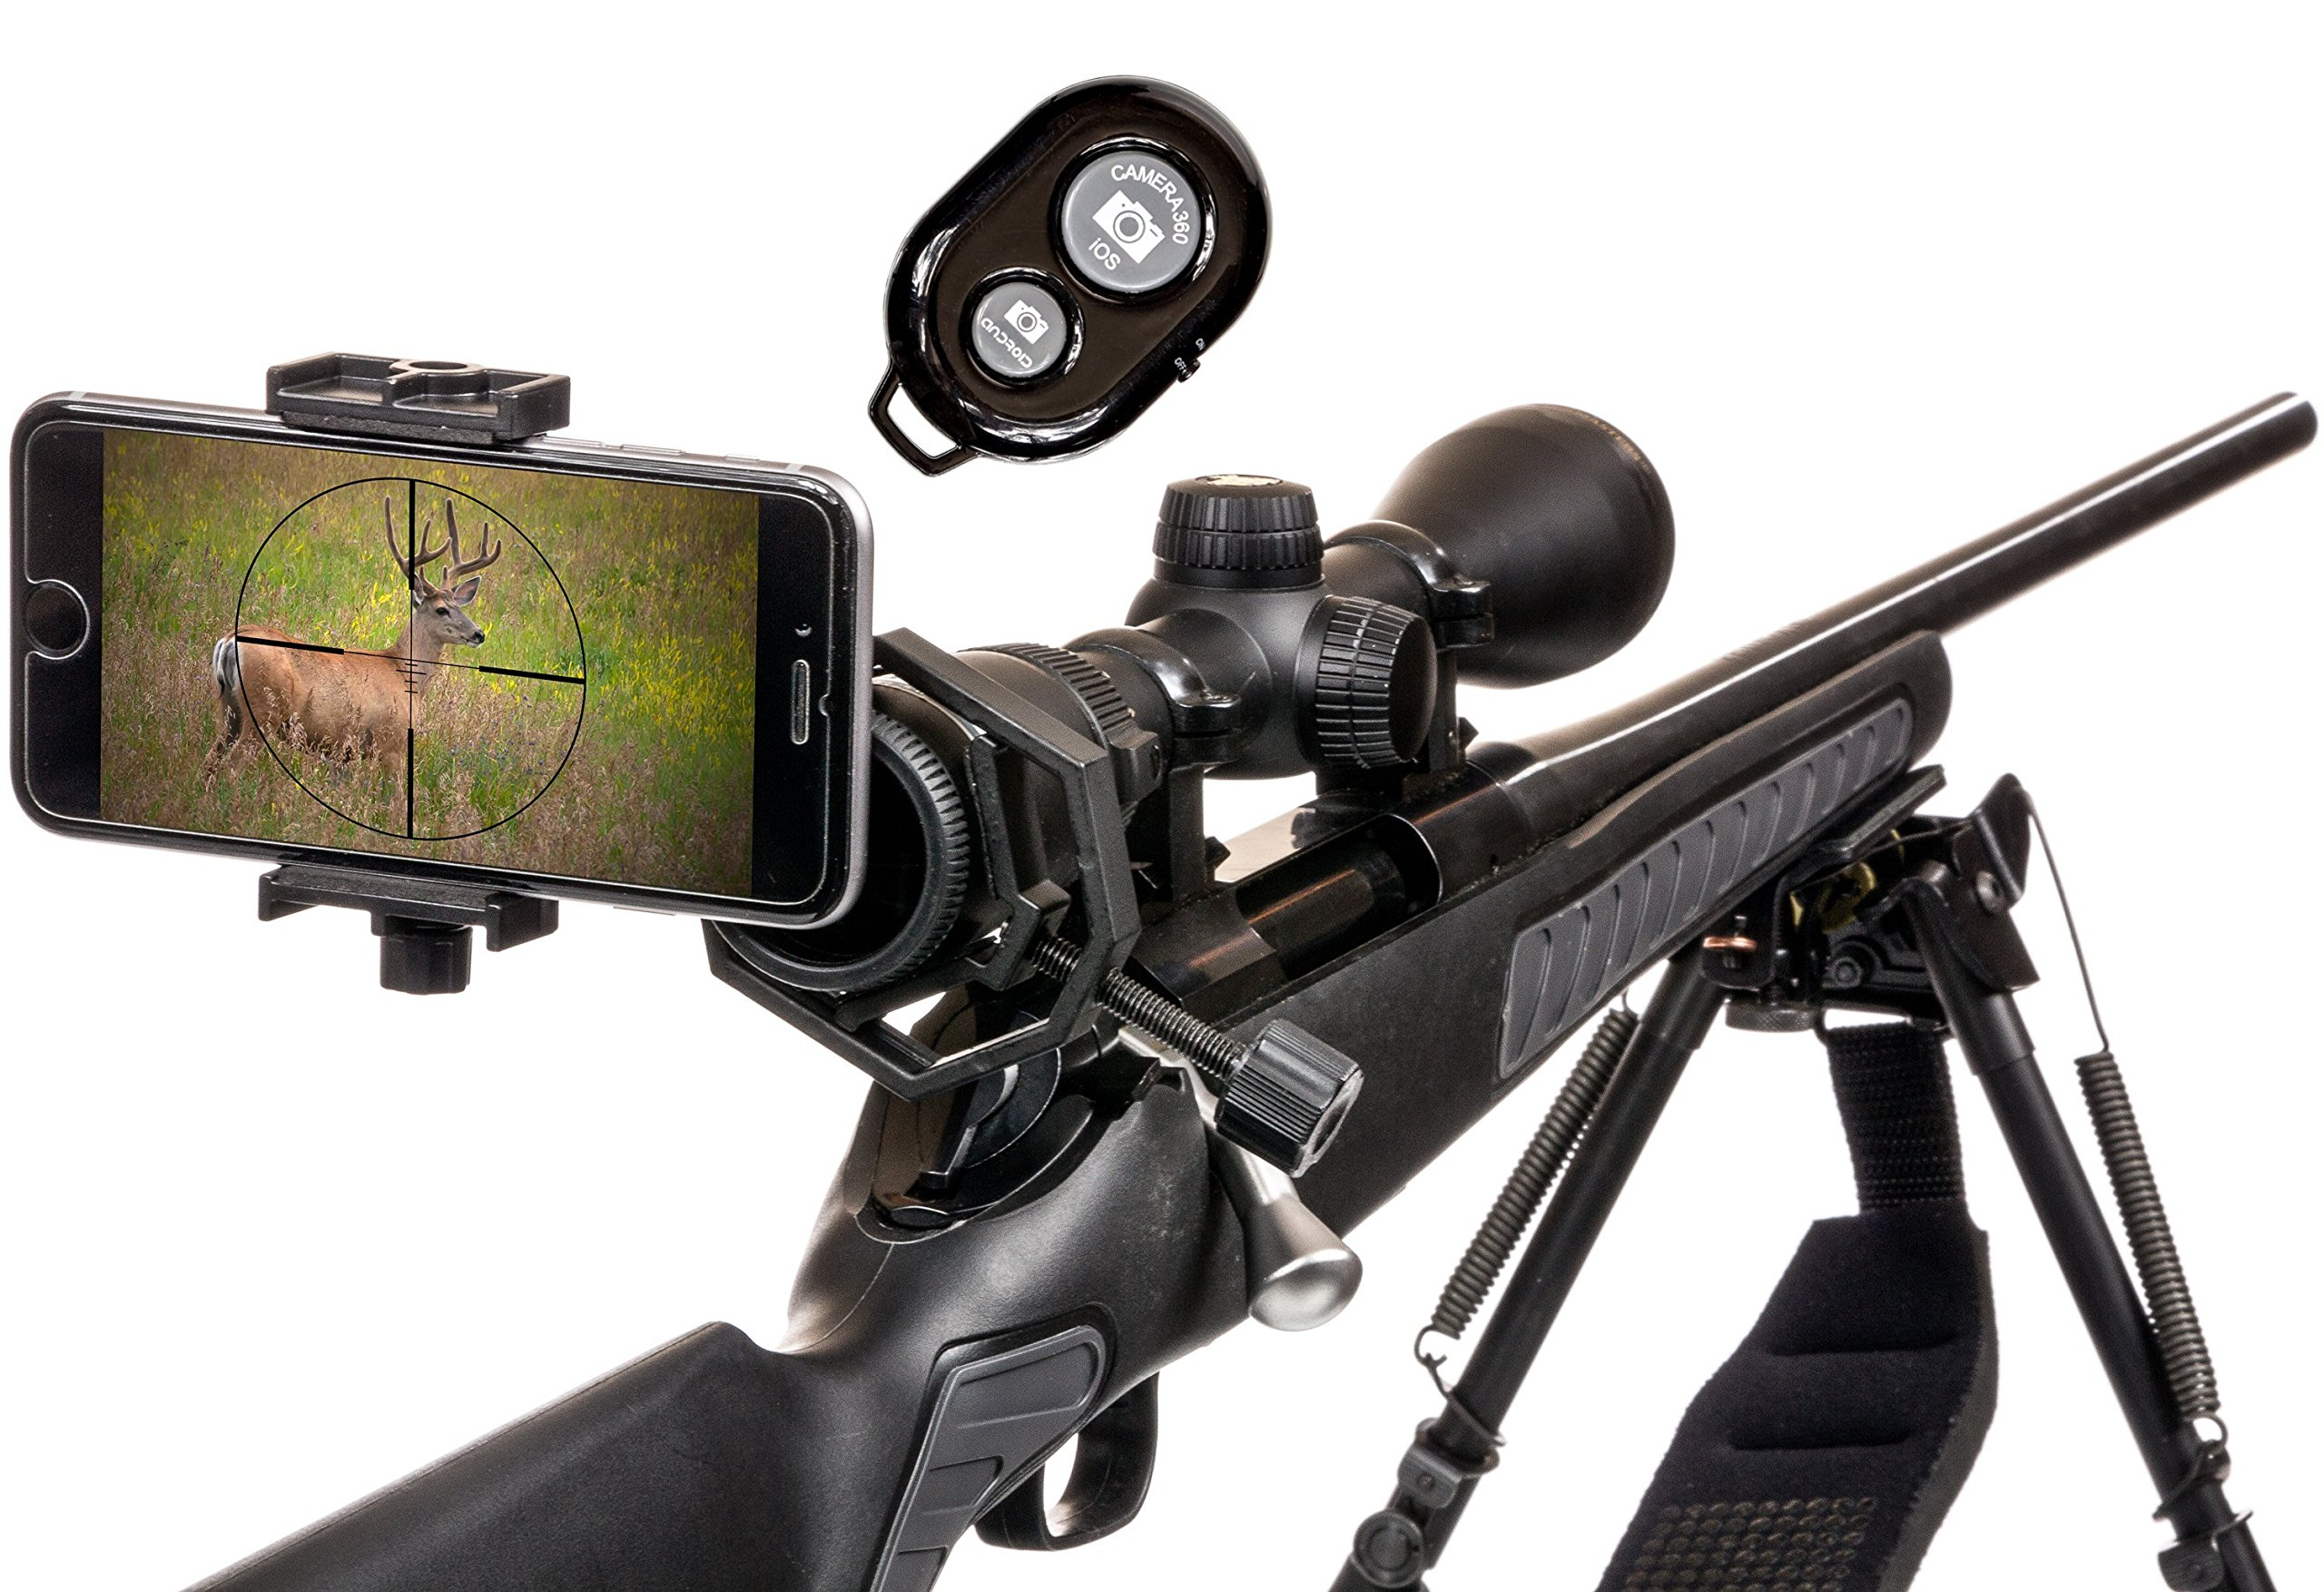 Spotting Scope Phone Adapter Kit - Universal Digiscoping Binocular, Telescope, Microscope, Monocular w/BT Remote. Make your Scope a Wireless Camera